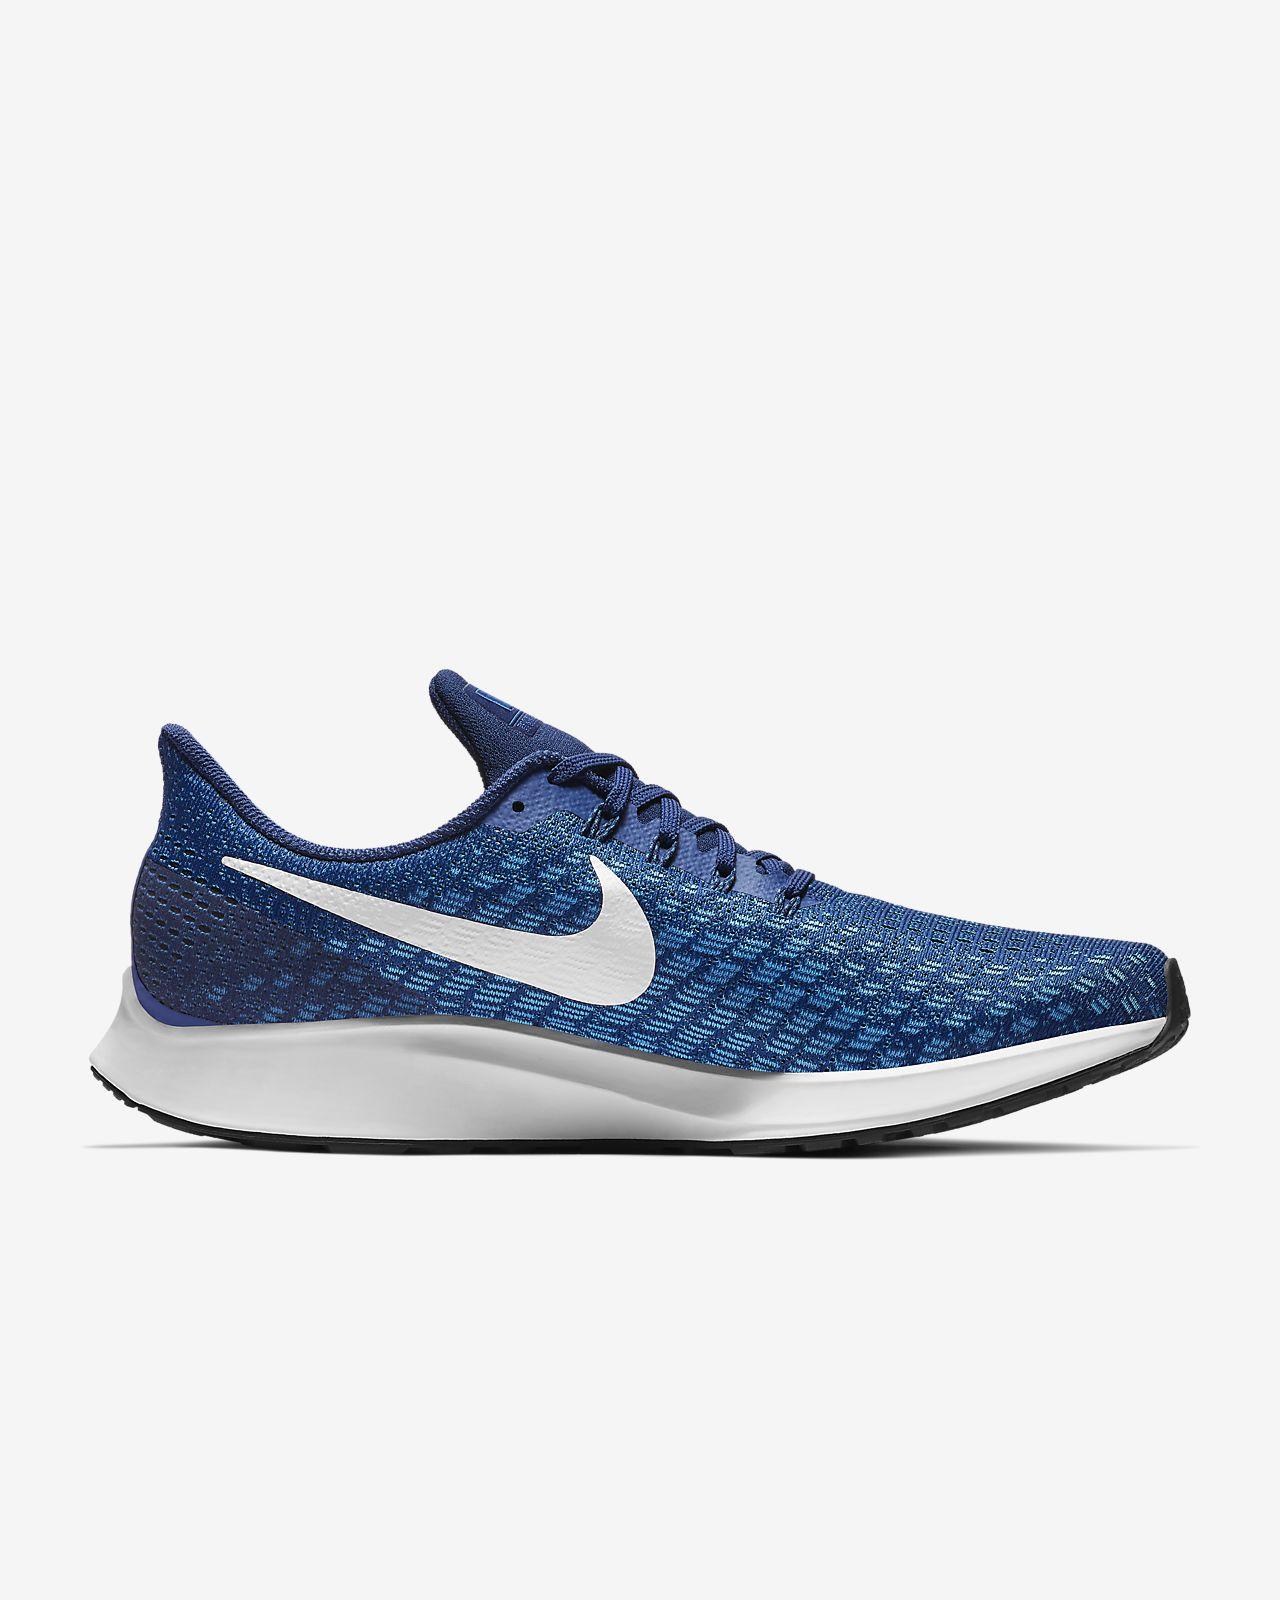 promo code bd8ac e7fc5 ... Chaussure de running Nike Air Zoom Pegasus 35 pour Homme